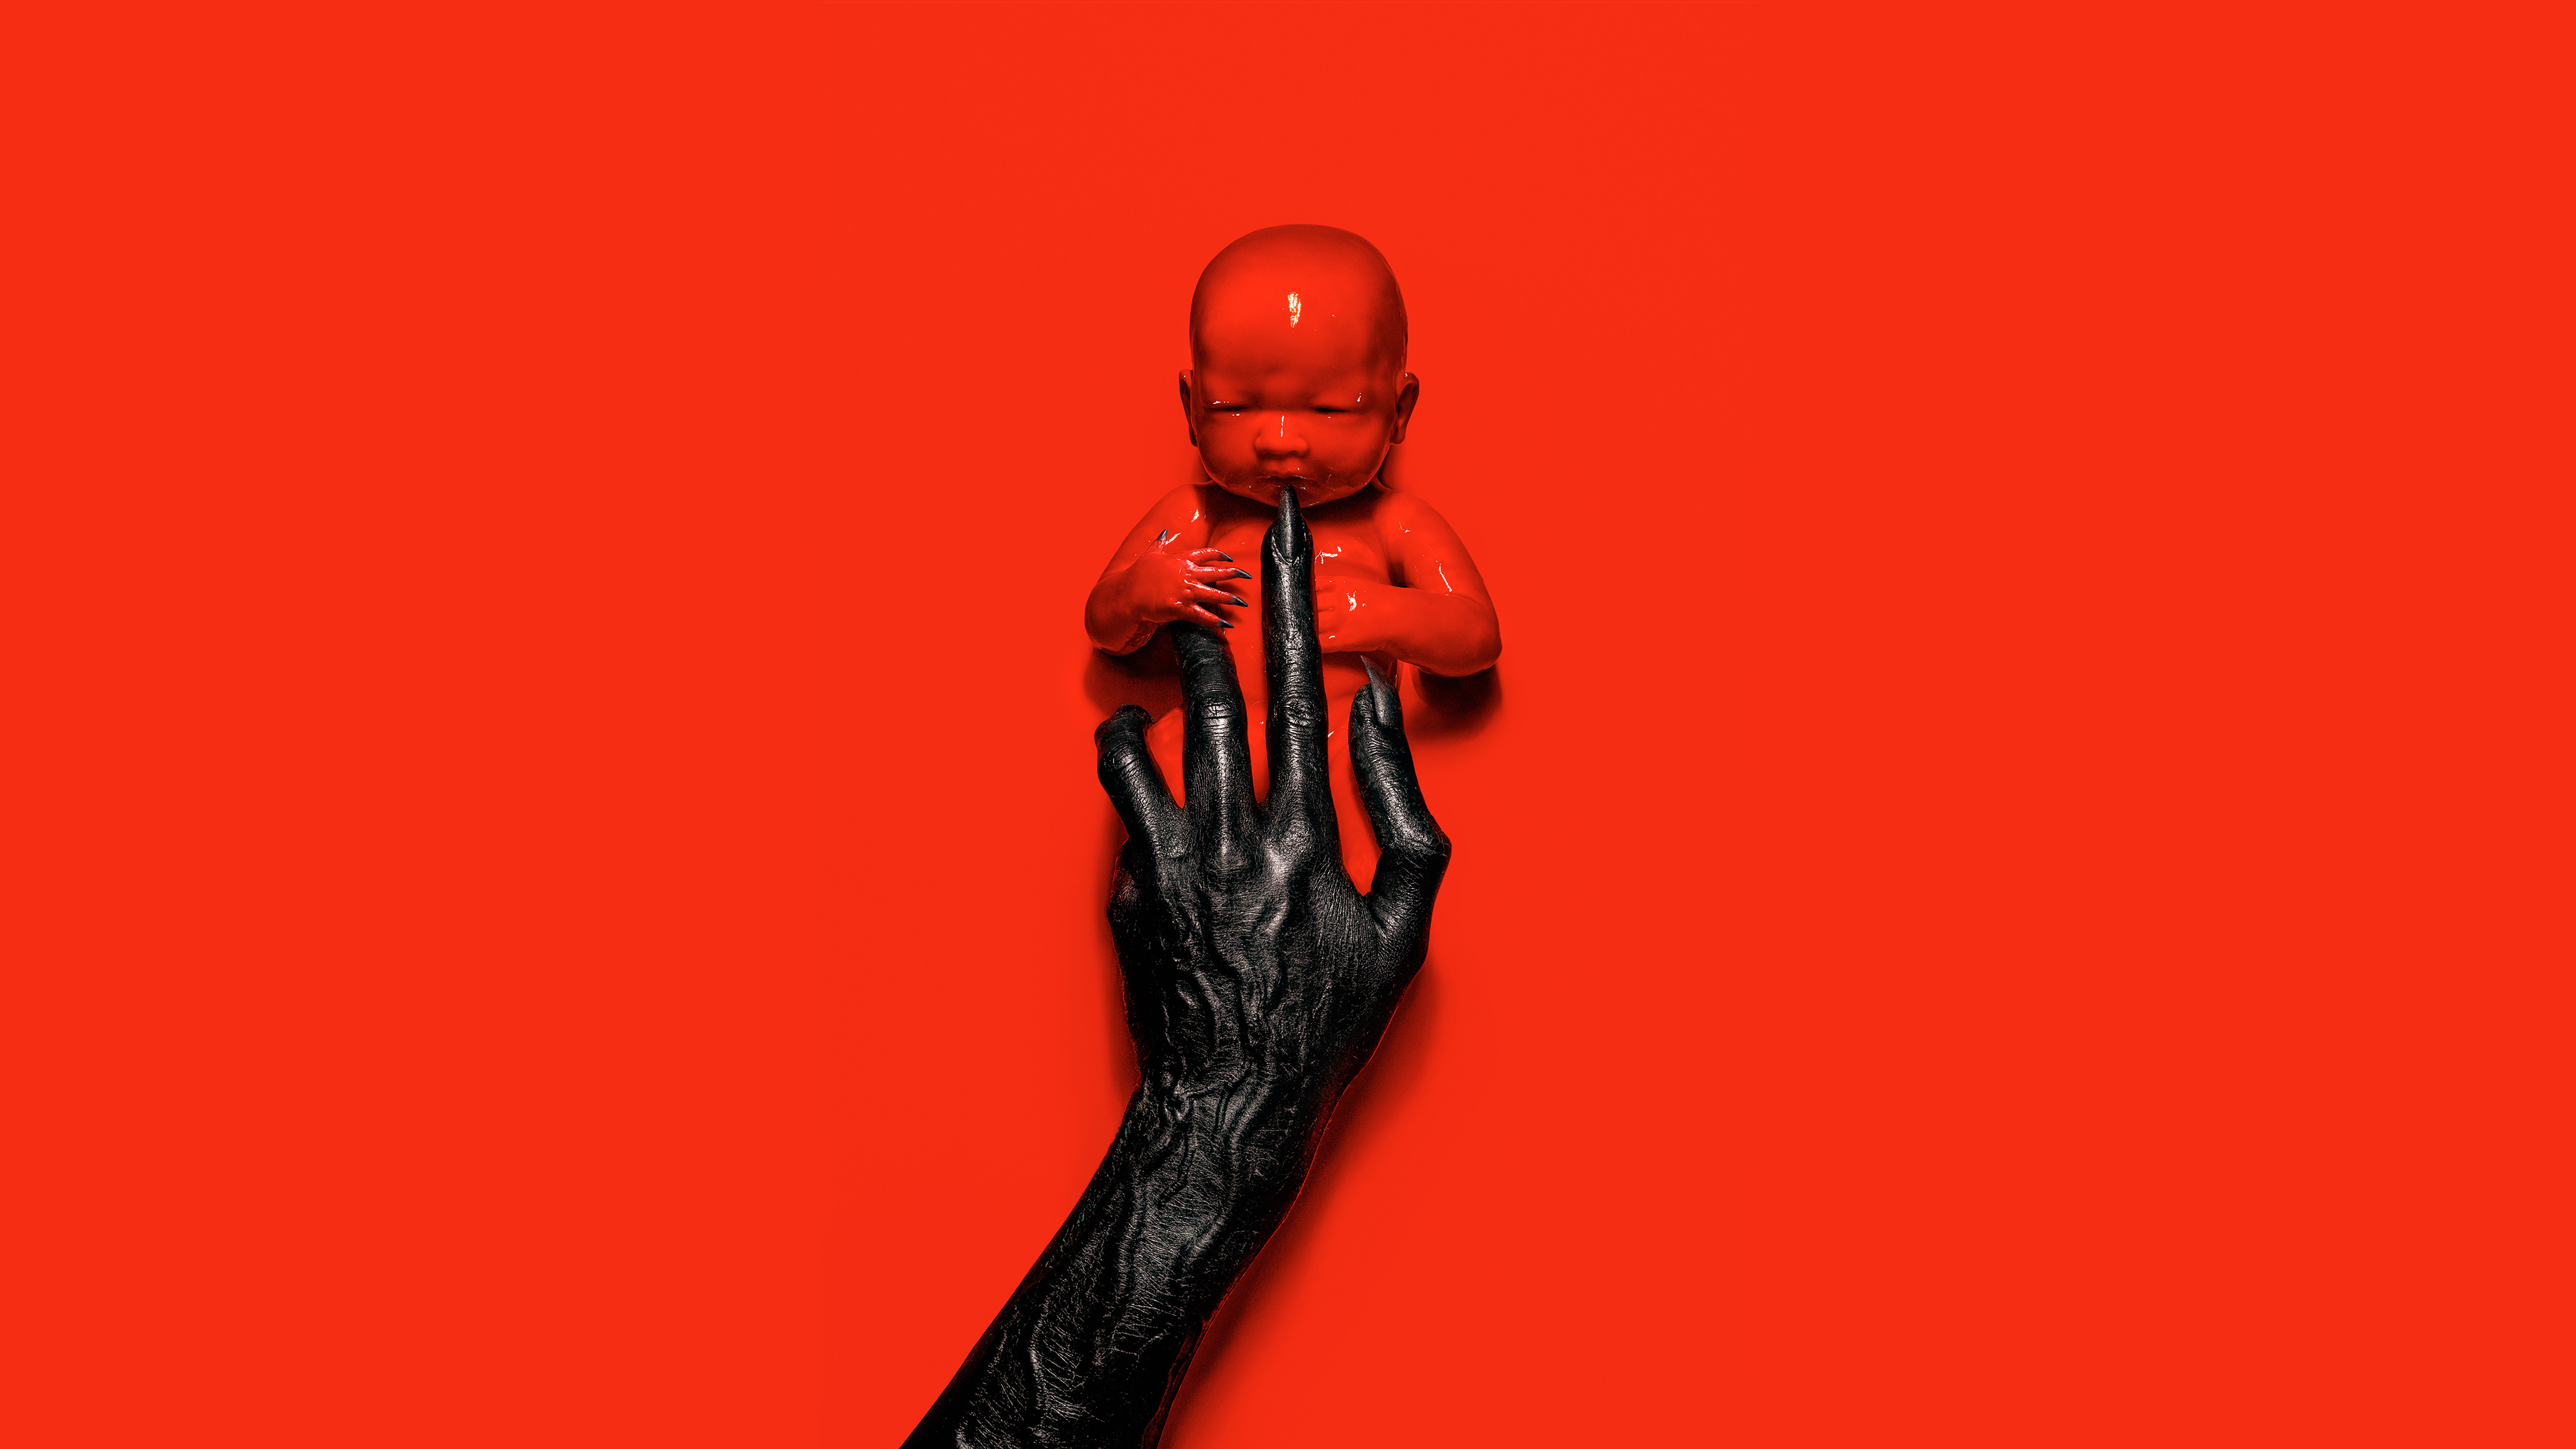 American Horror Story Season 8 2018 4k Hd Tv Shows 4k Wallpapers